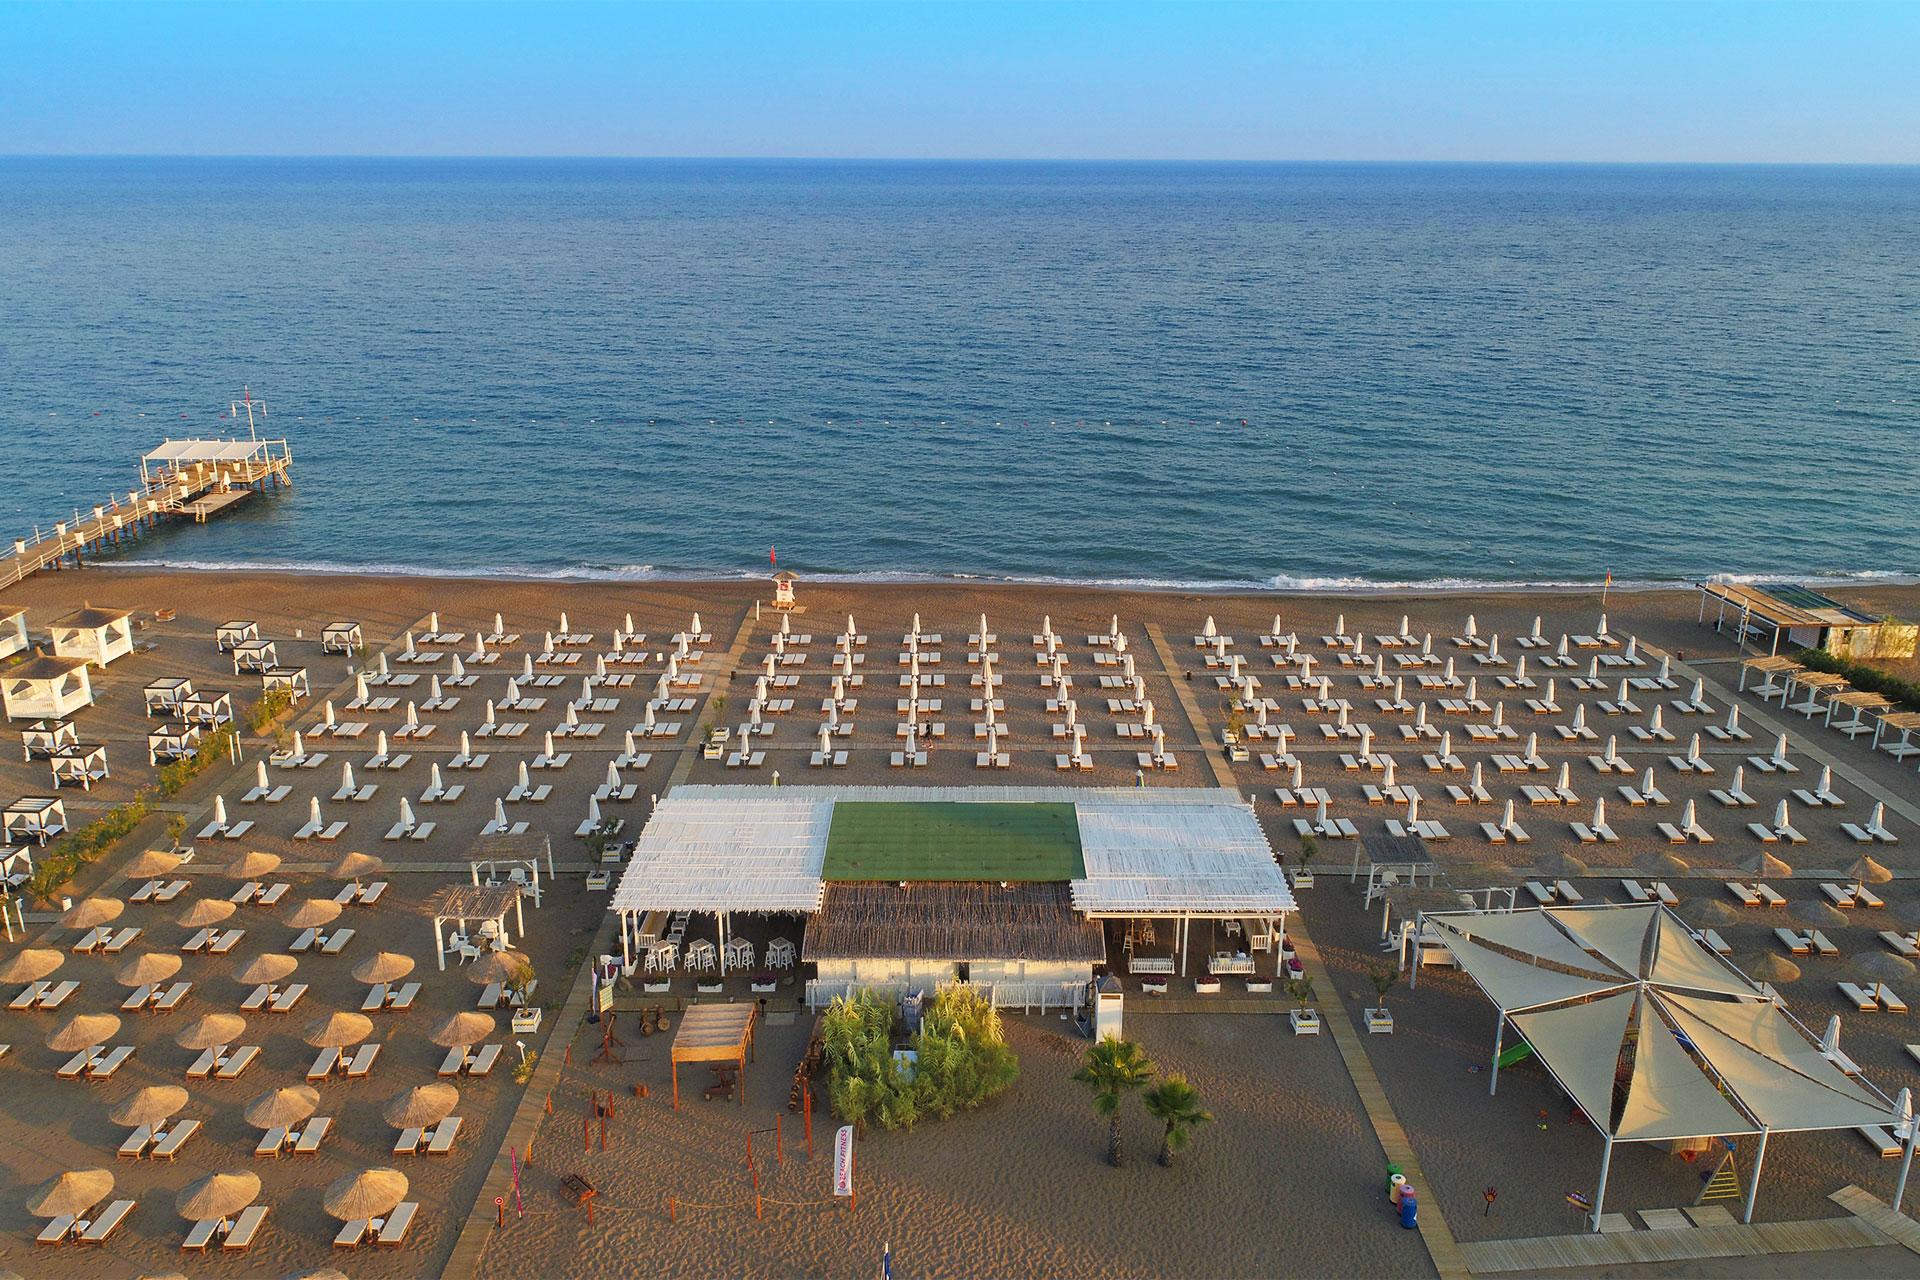 Бассейны И Пляж Lara Barut Collection - Antalya Otelleri - Herşey Dahil  Oteller